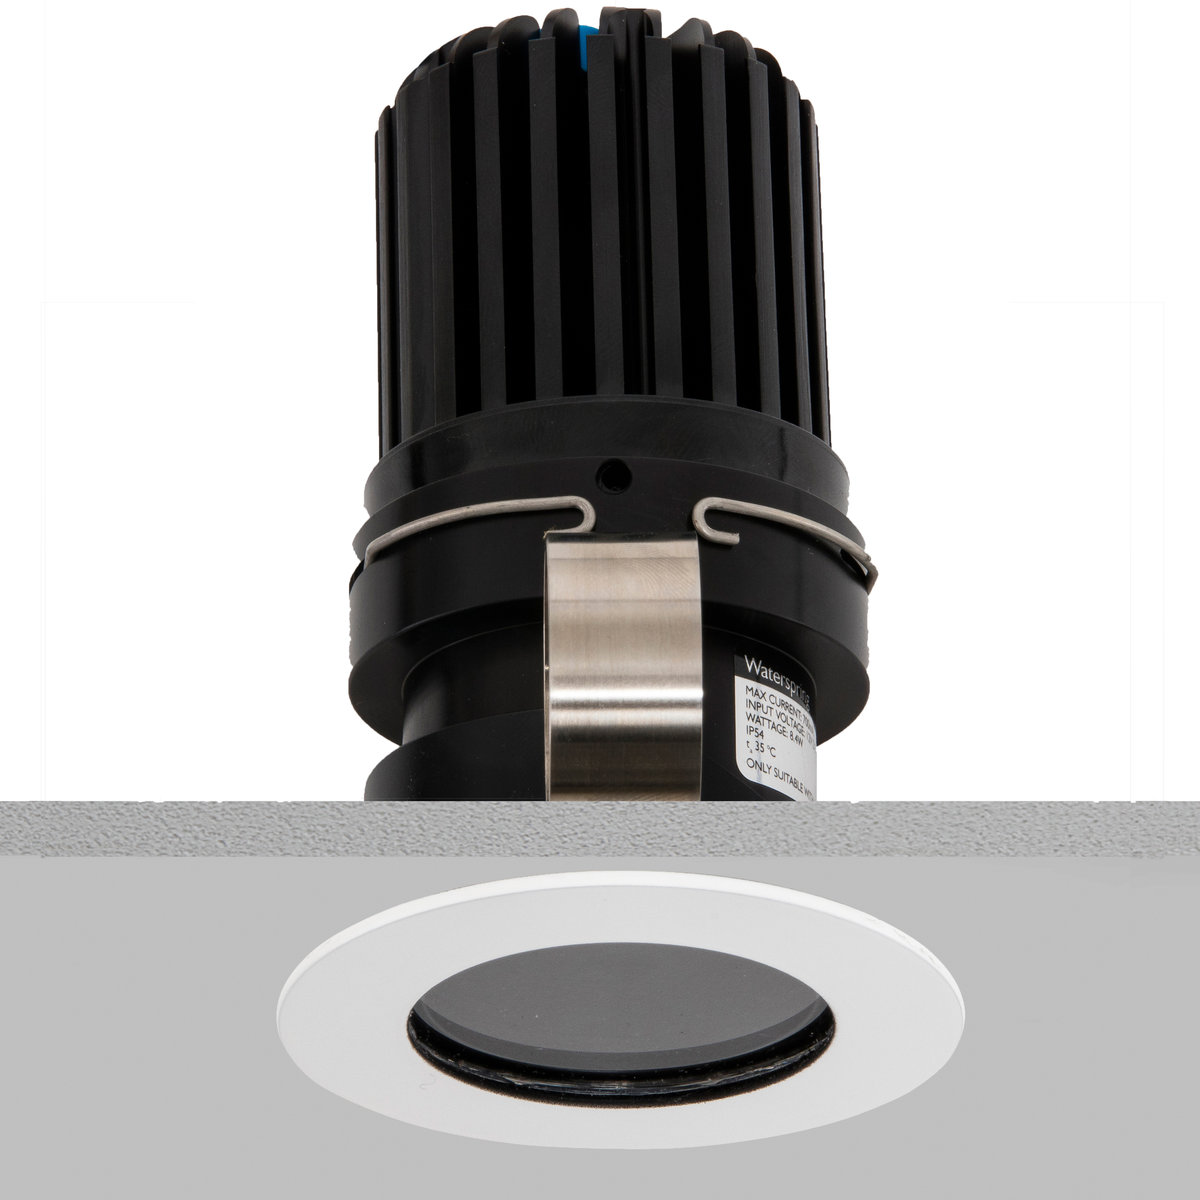 Waterspring 50+ IP Rated Downlight main image